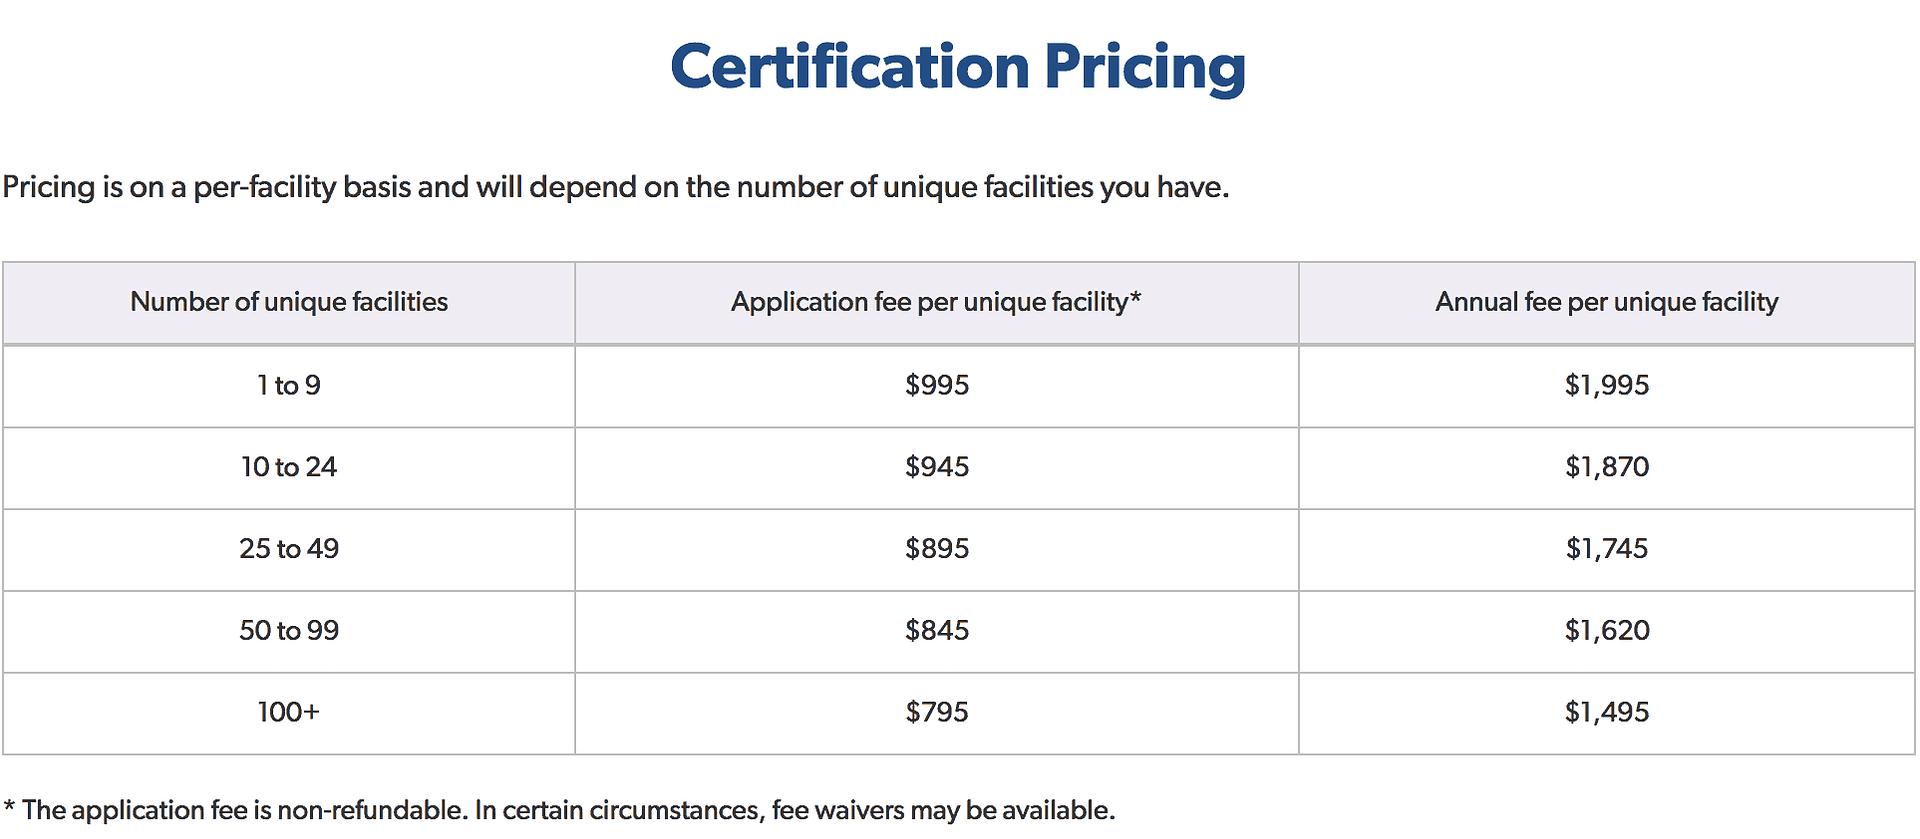 Pricing chart for certification for LegitScript